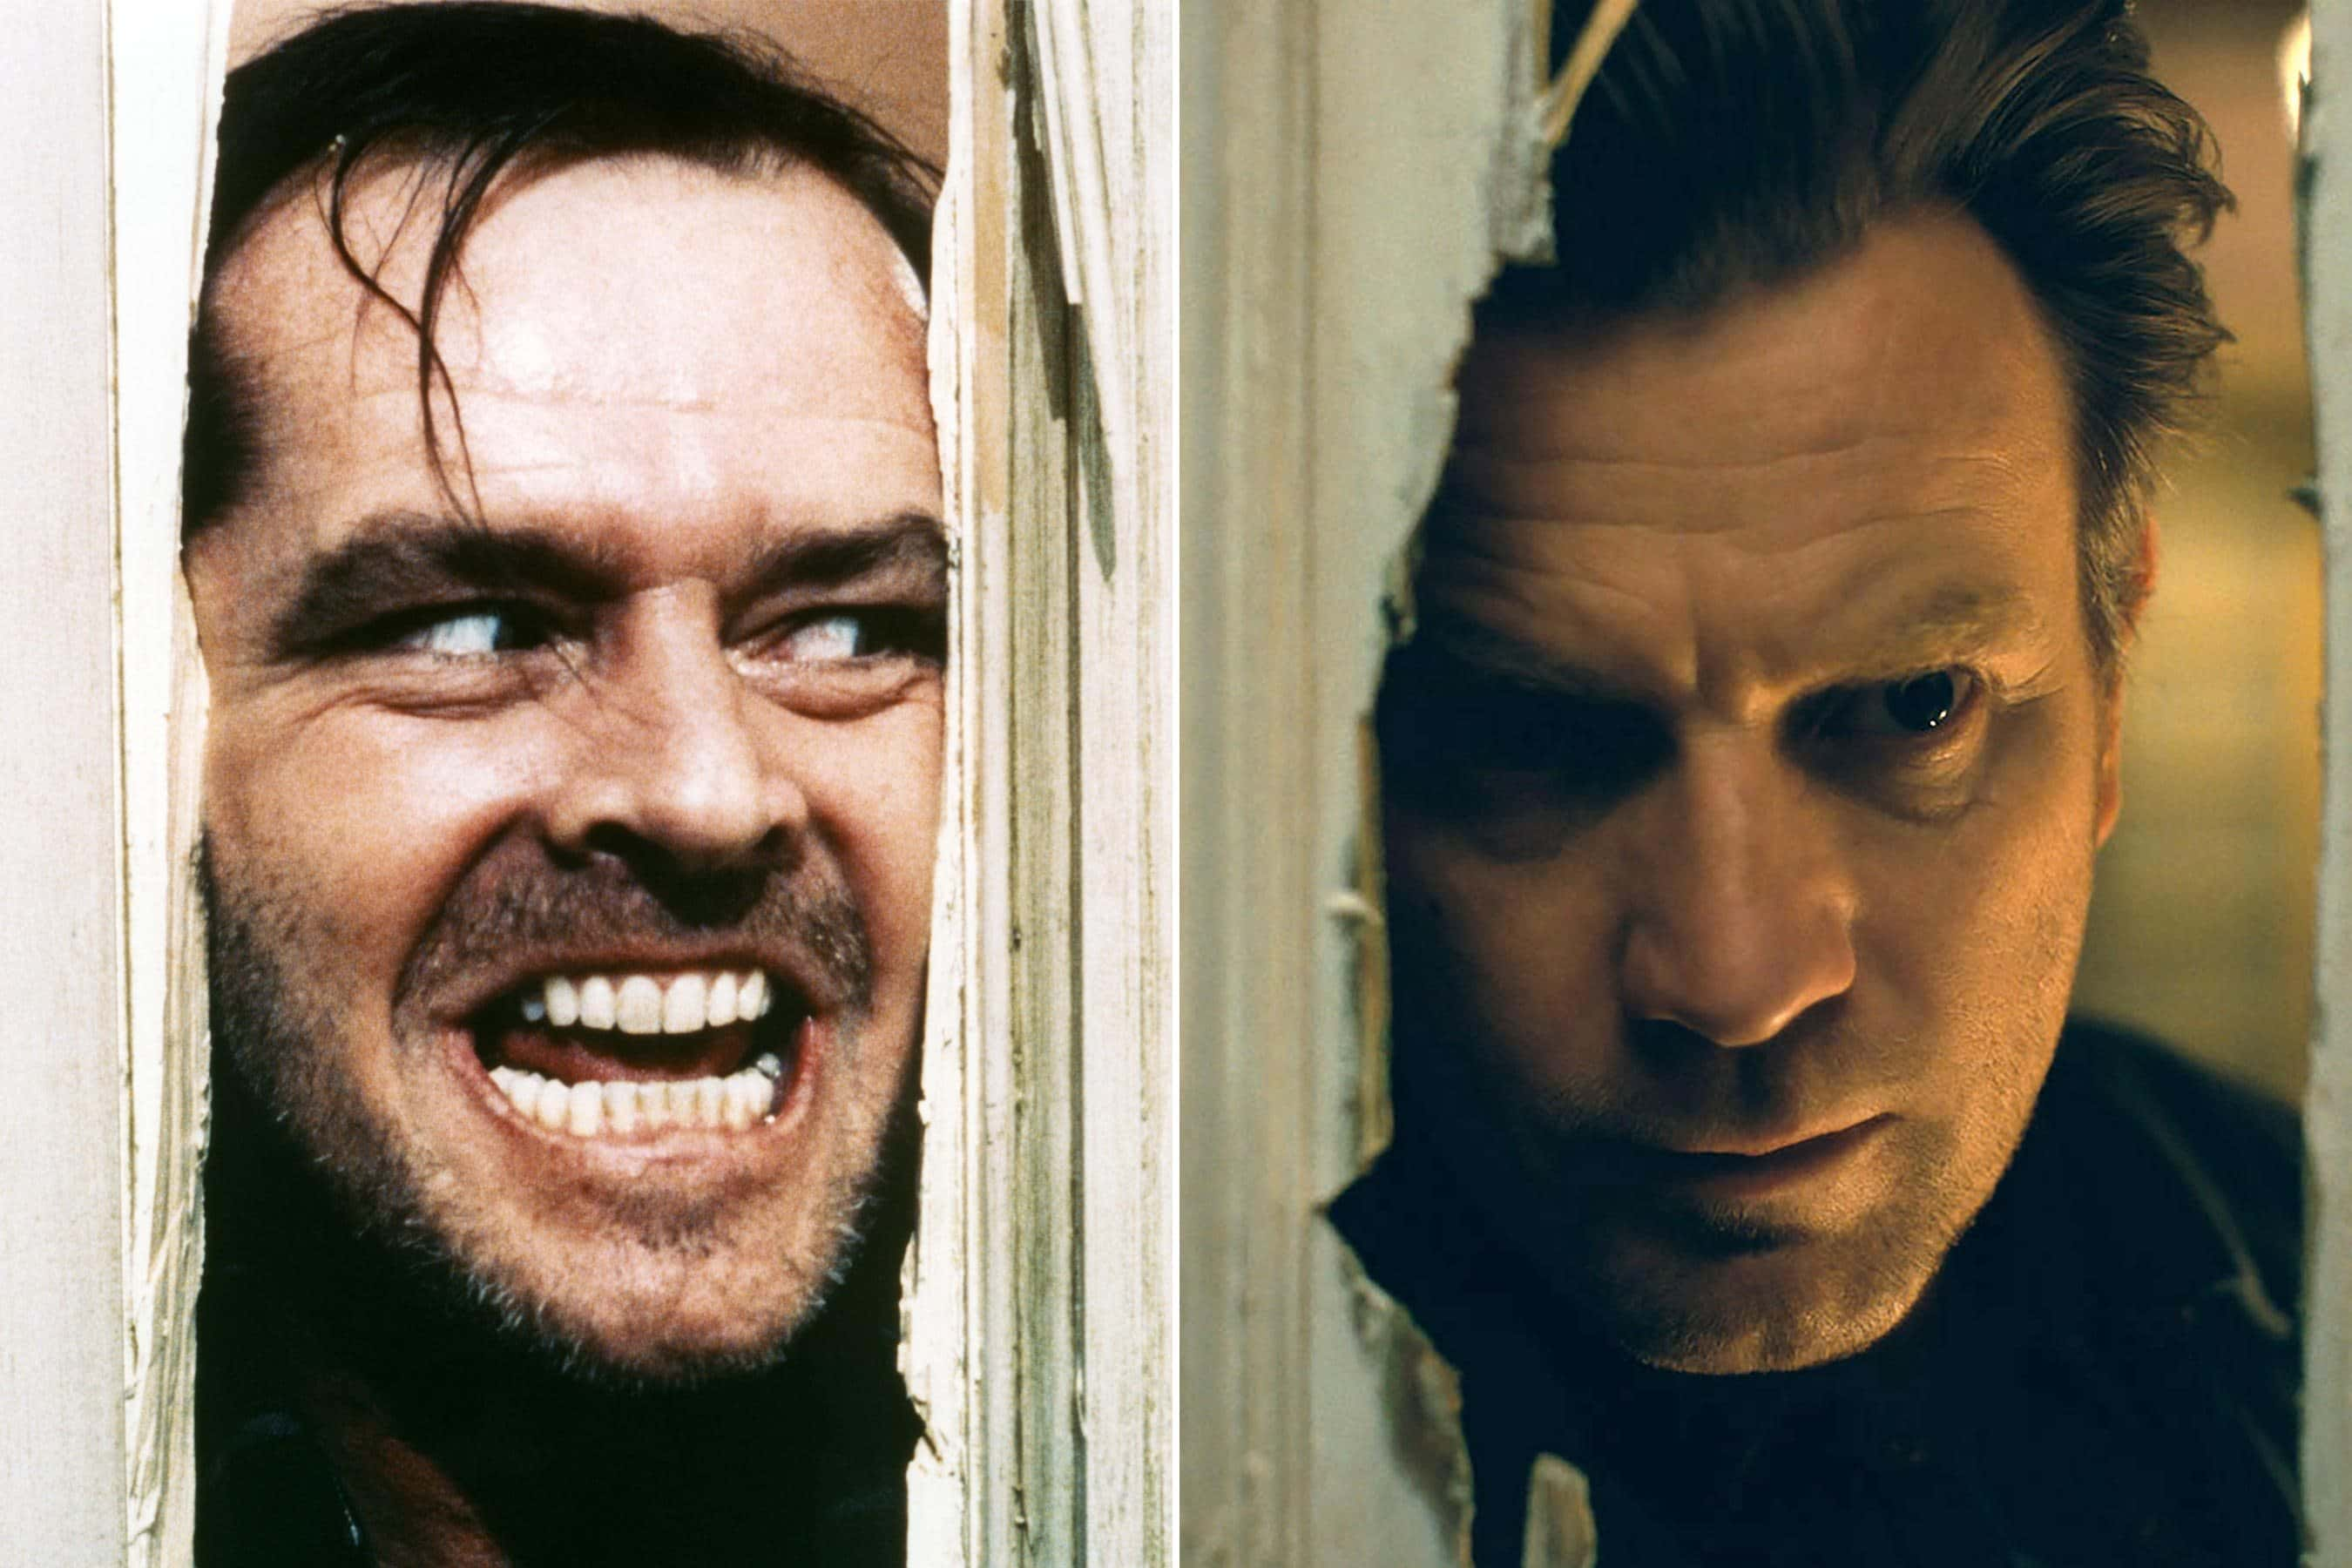 Like Father, like Son: Jack Nicholson (left) and Ewan McGregor peer through the Overlook's bathroom door in The Shining and Doctor Sleep.